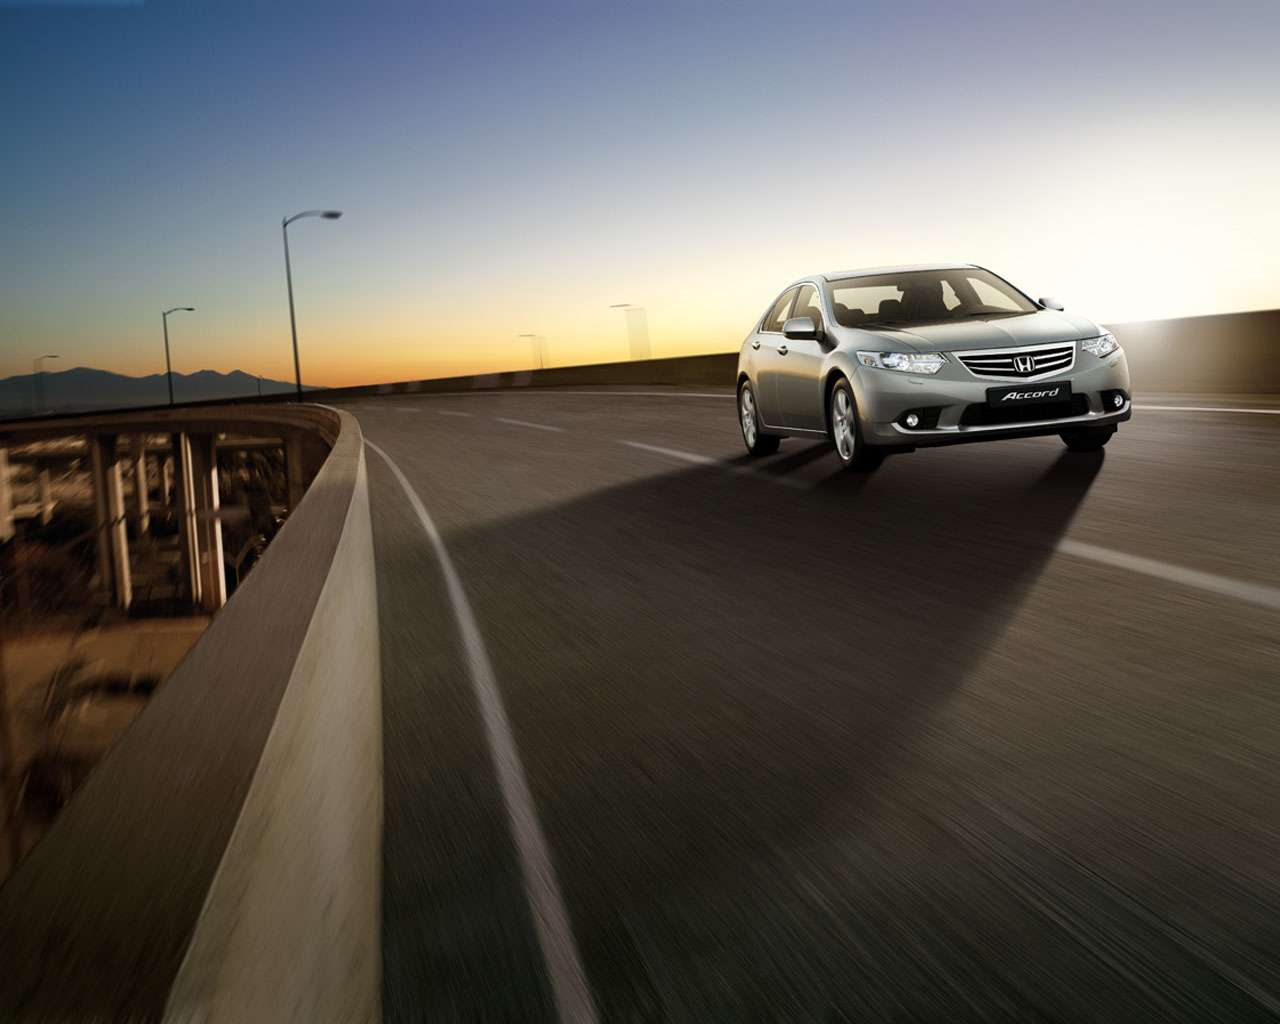 Nowa Honda Accord 2011 zdjęcia